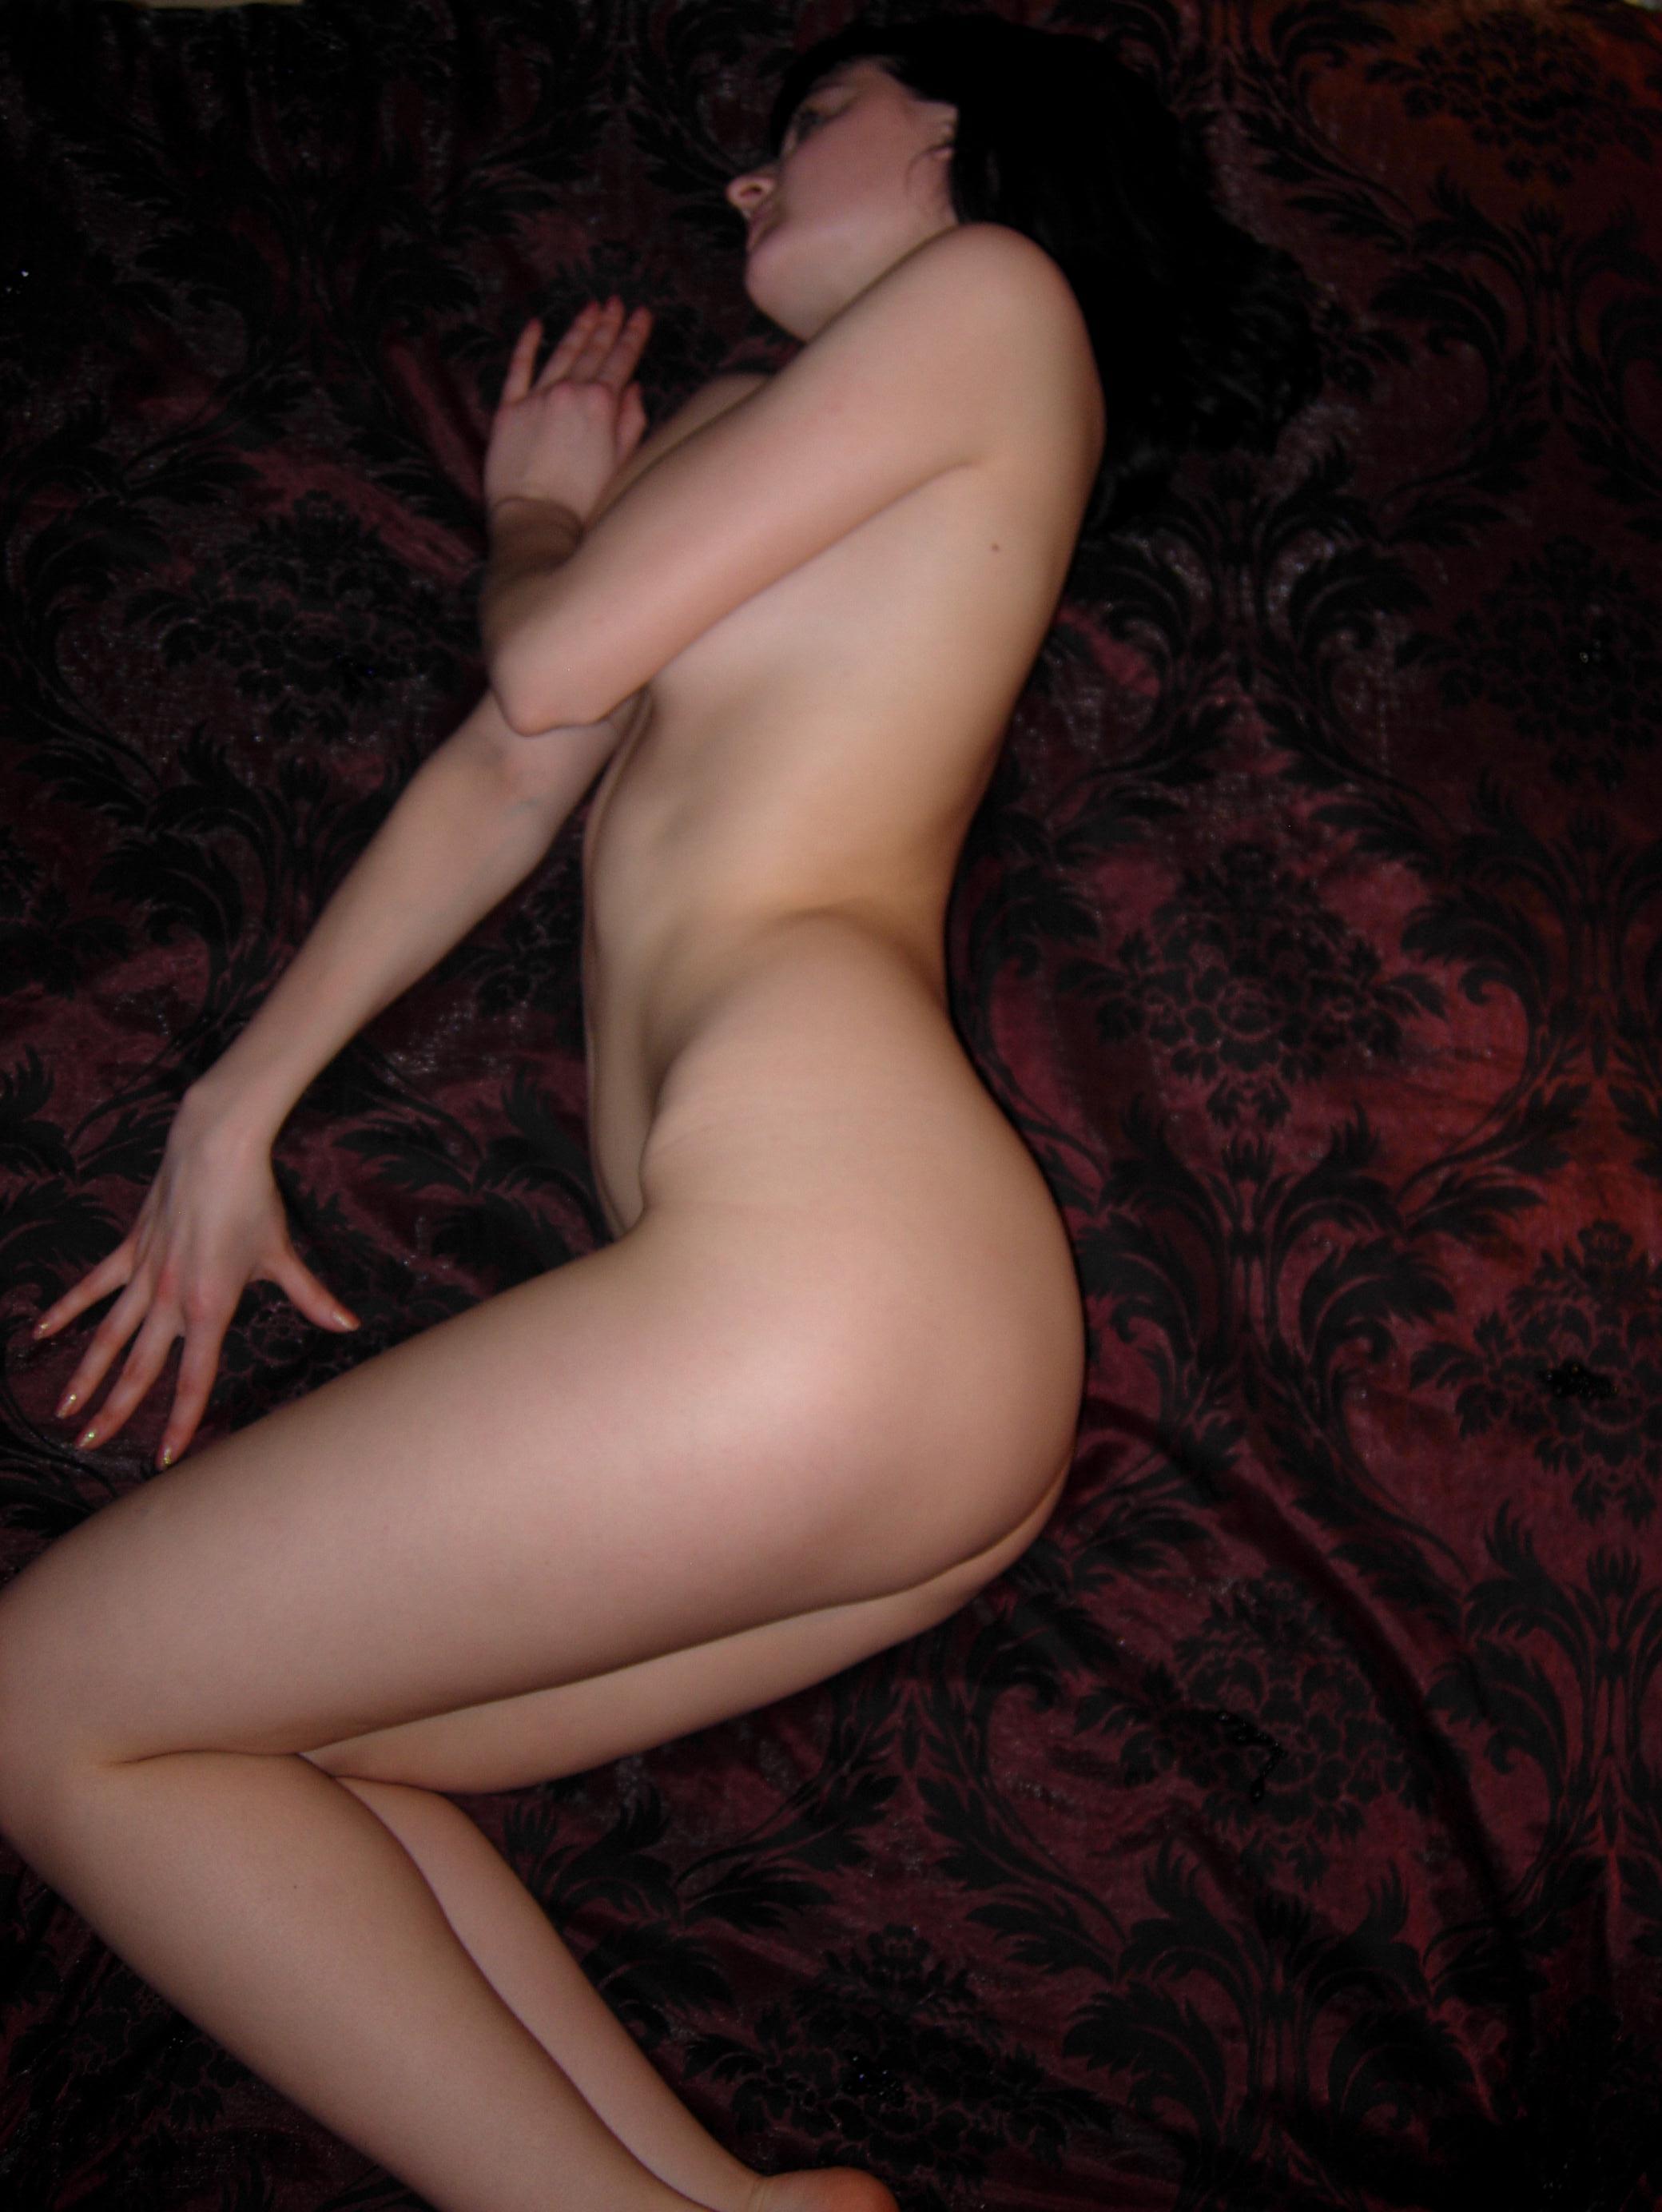 amateur-nude-brunette-bedroom-25